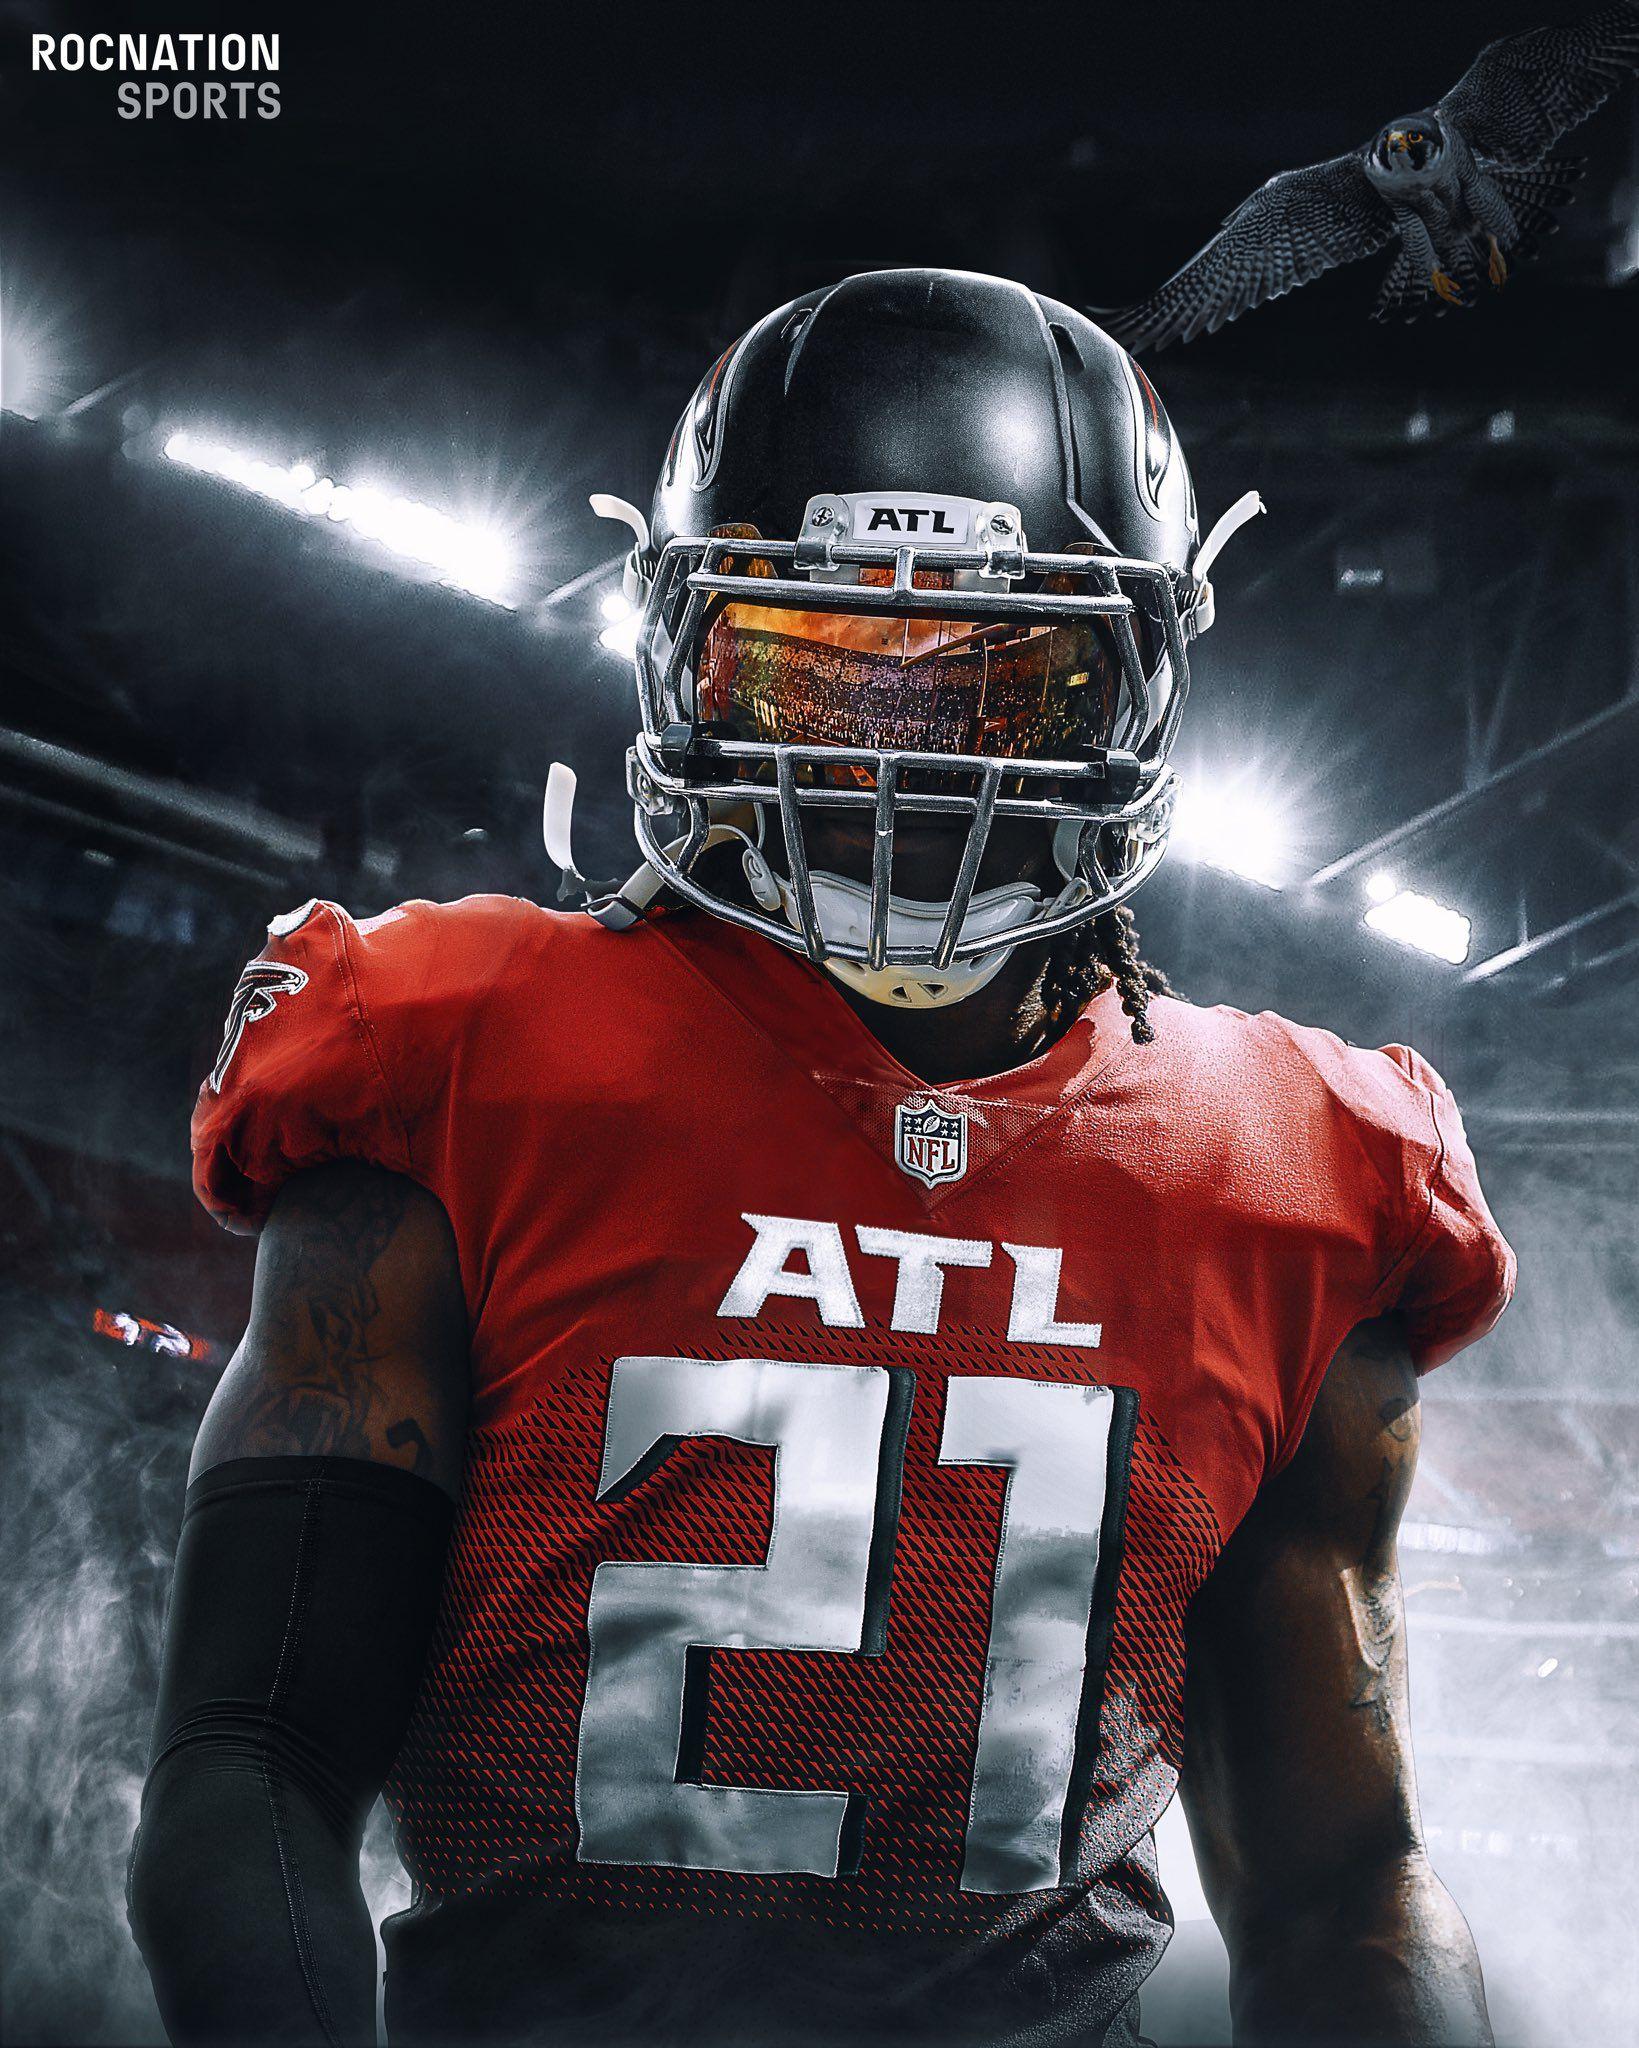 Pin By Cmillionaire On Atlanta Falcons In 2020 Atlanta Falcons Football Falcons Football Todd Gurley